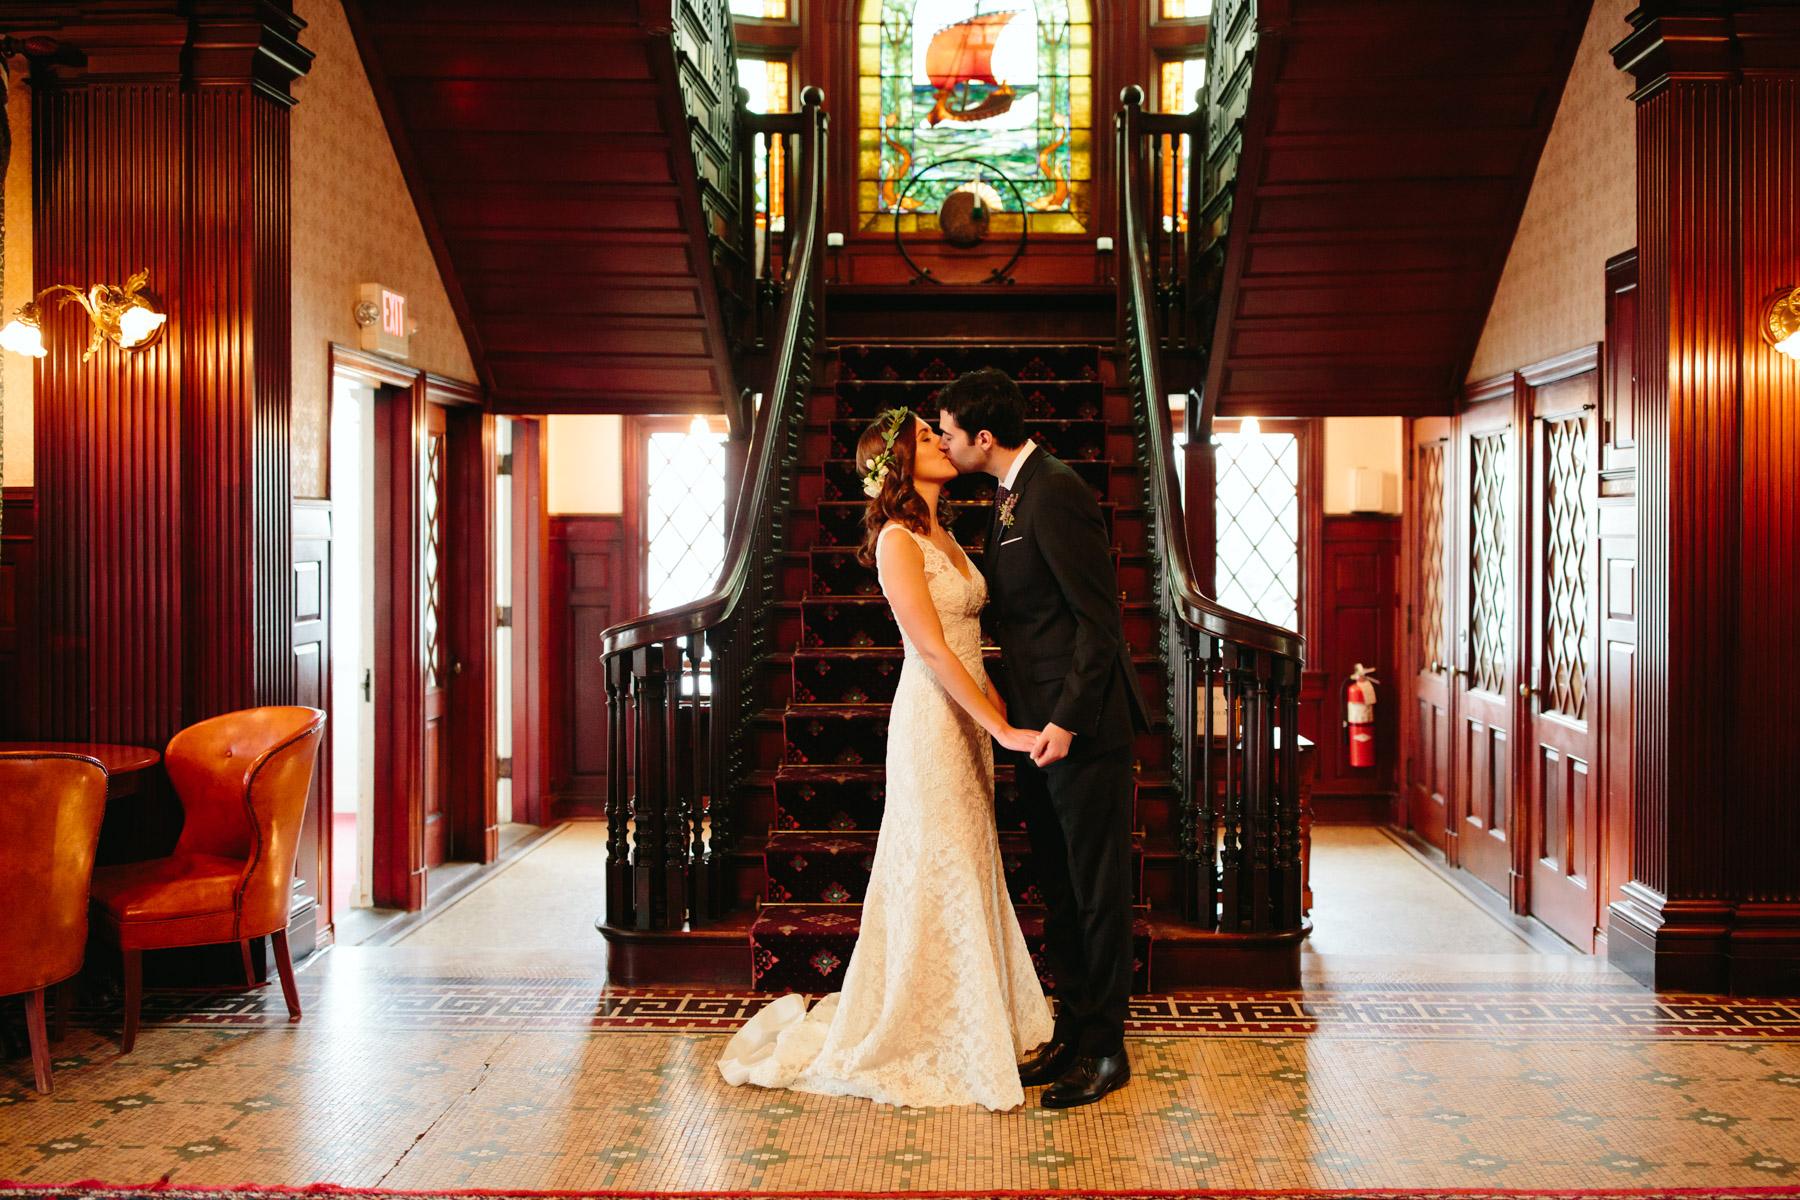 New England Wedding Photographer 53 Documentary Wedding Photographer Kerri Green